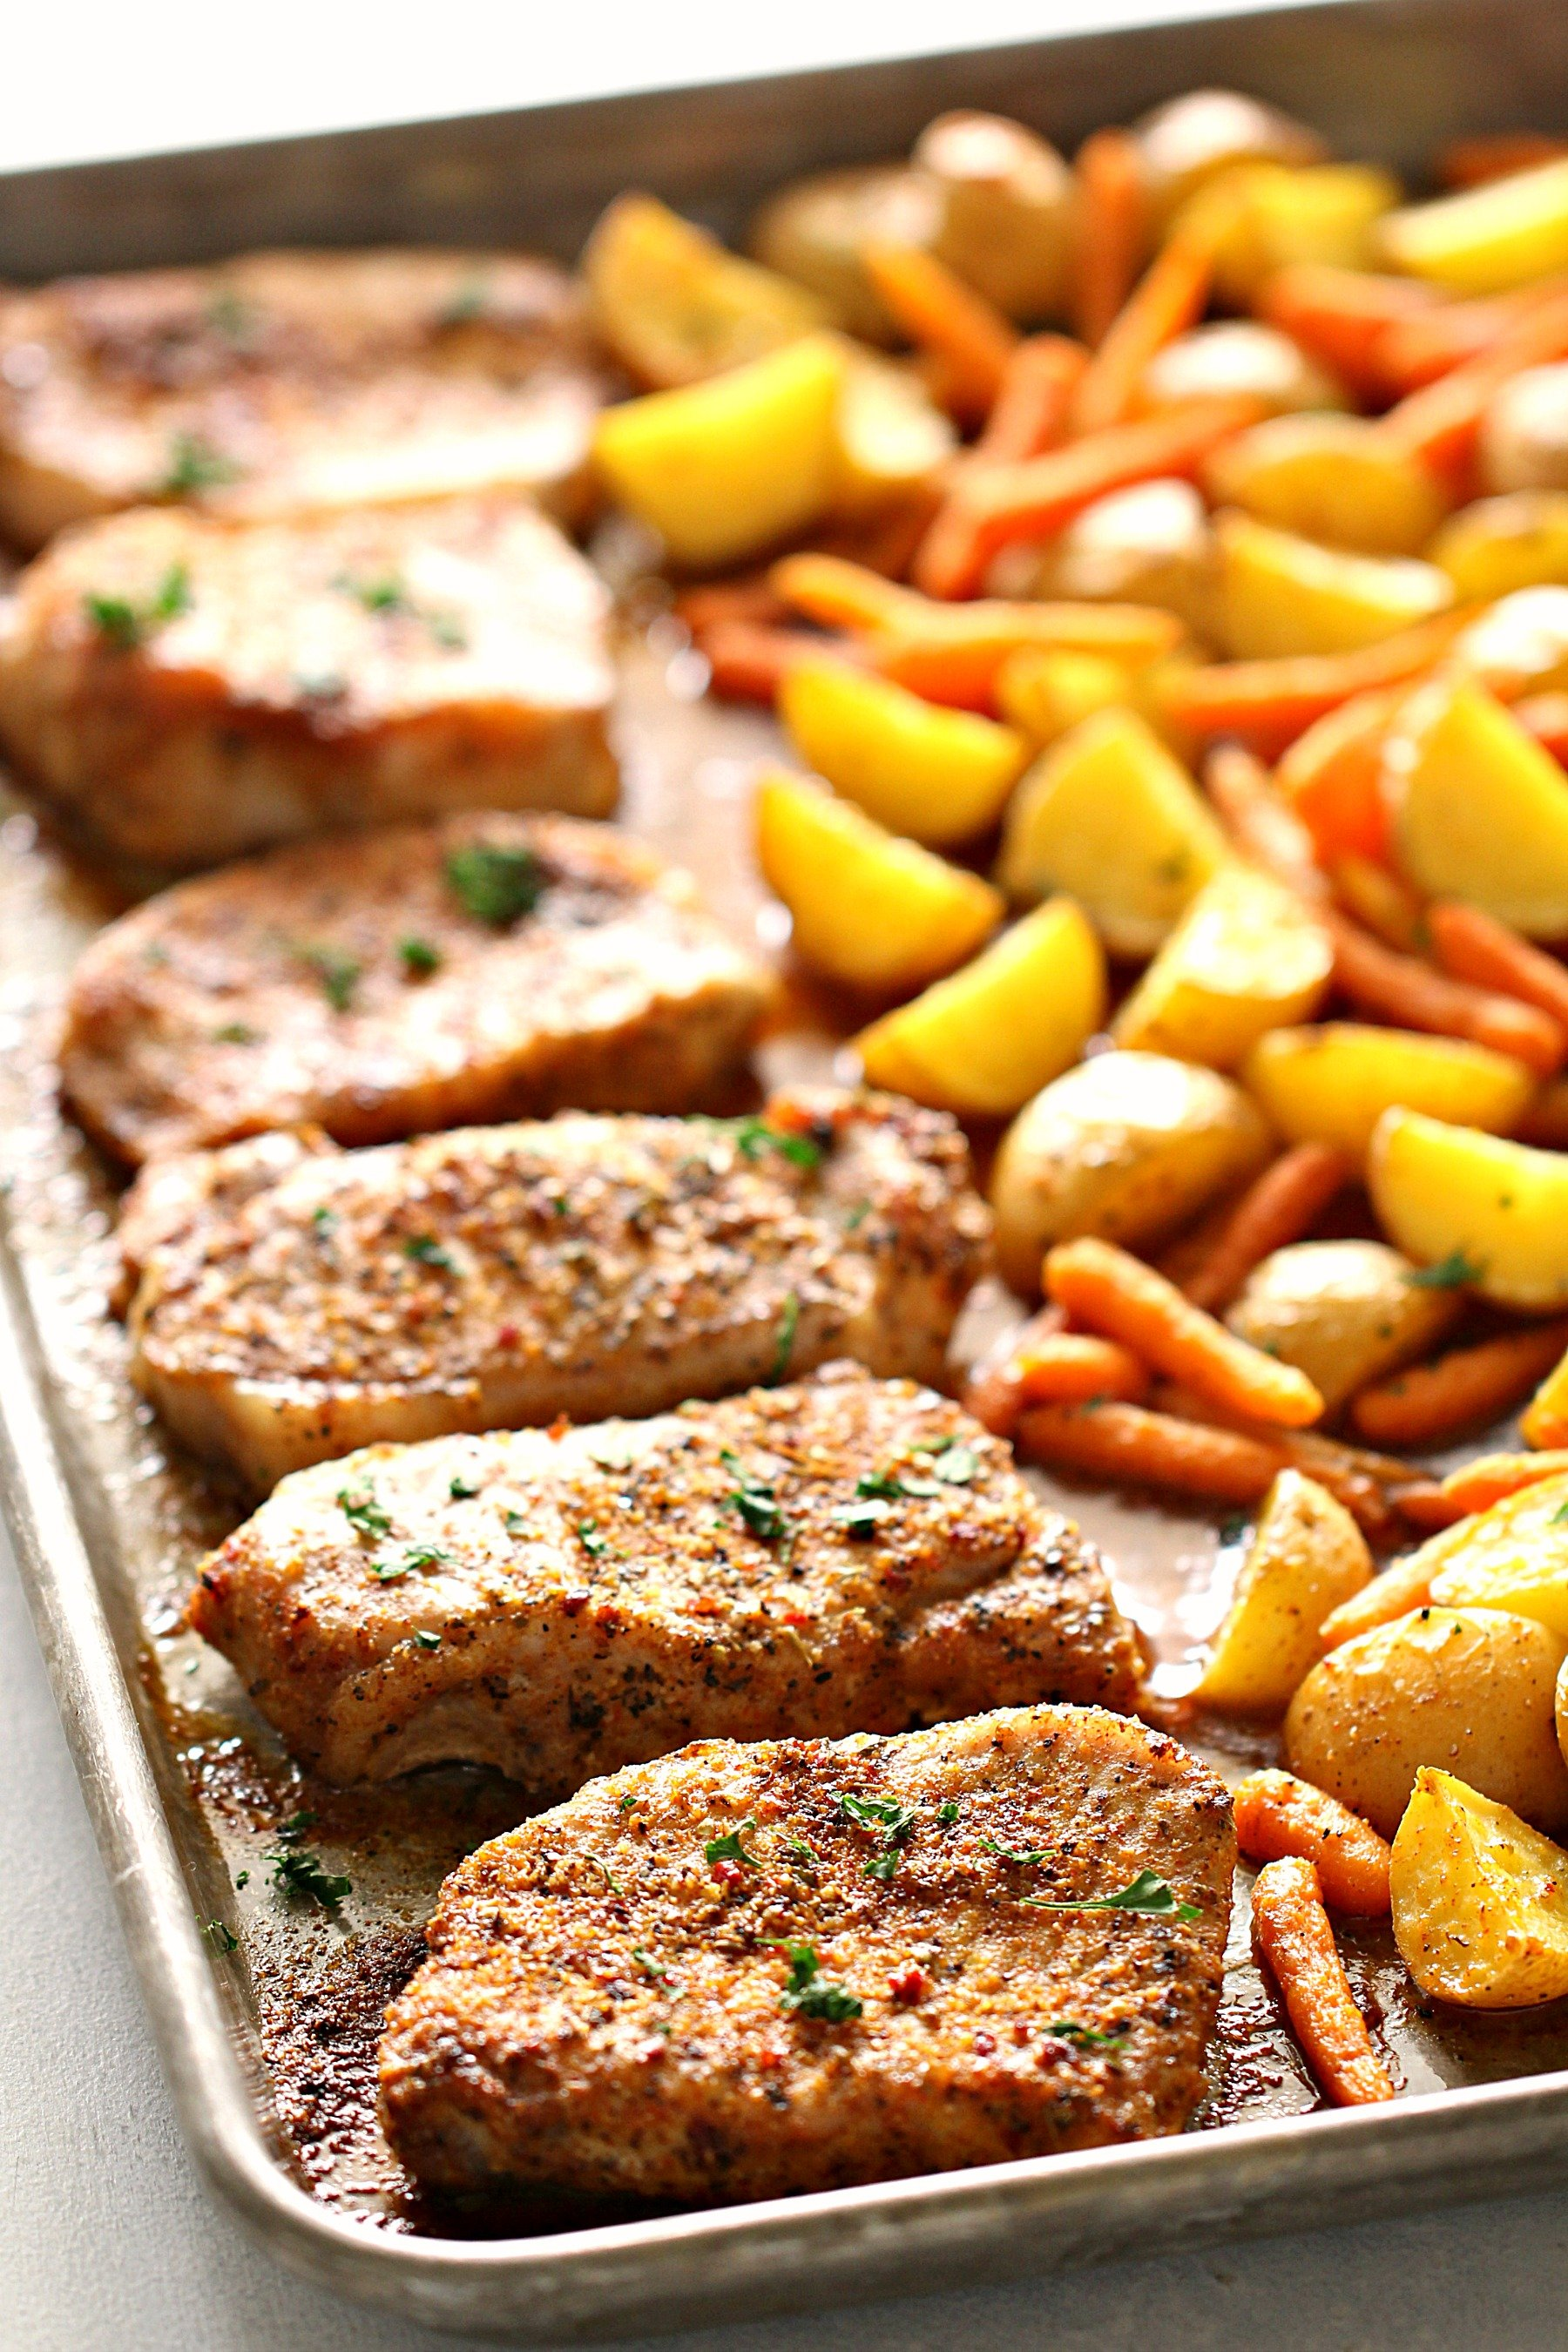 Sheet Pan Italian Pork Chops with Potatoes and Carrots